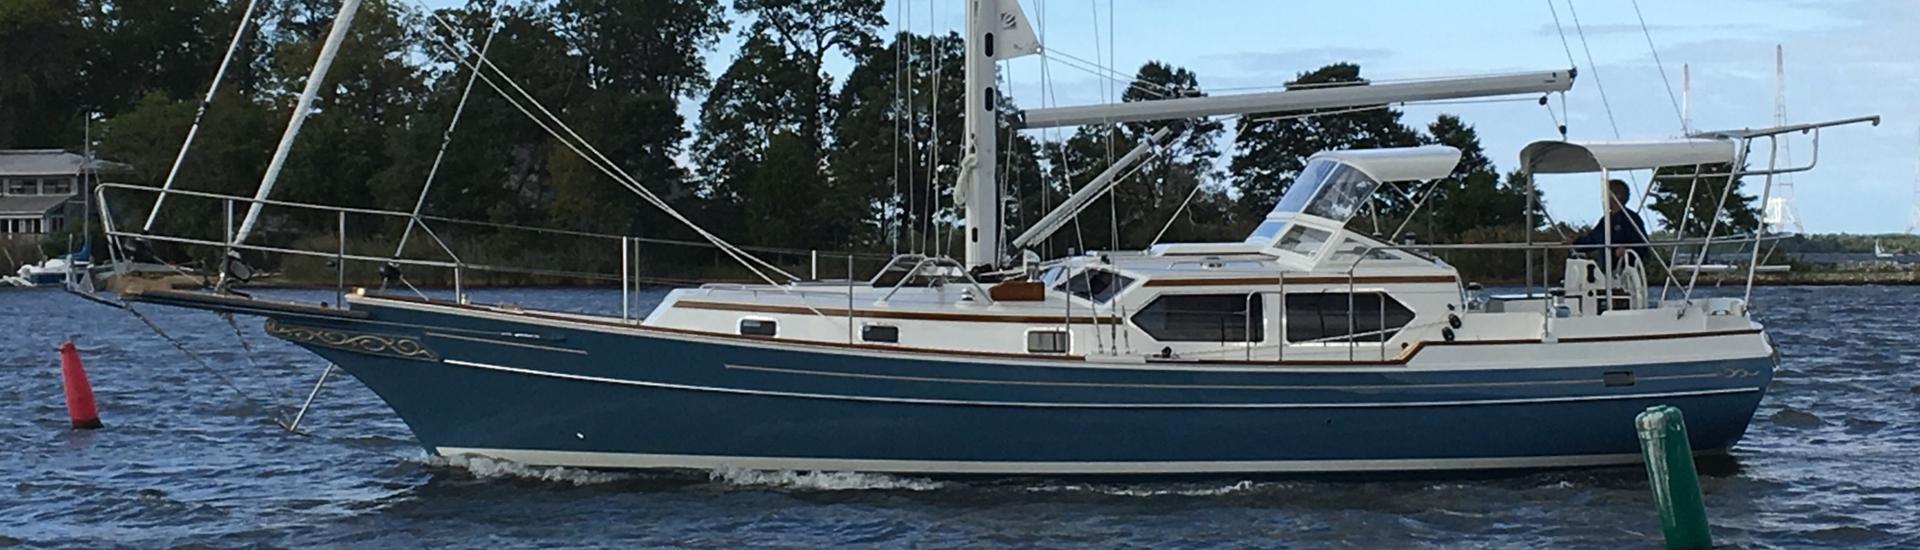 Gozzard Yachts